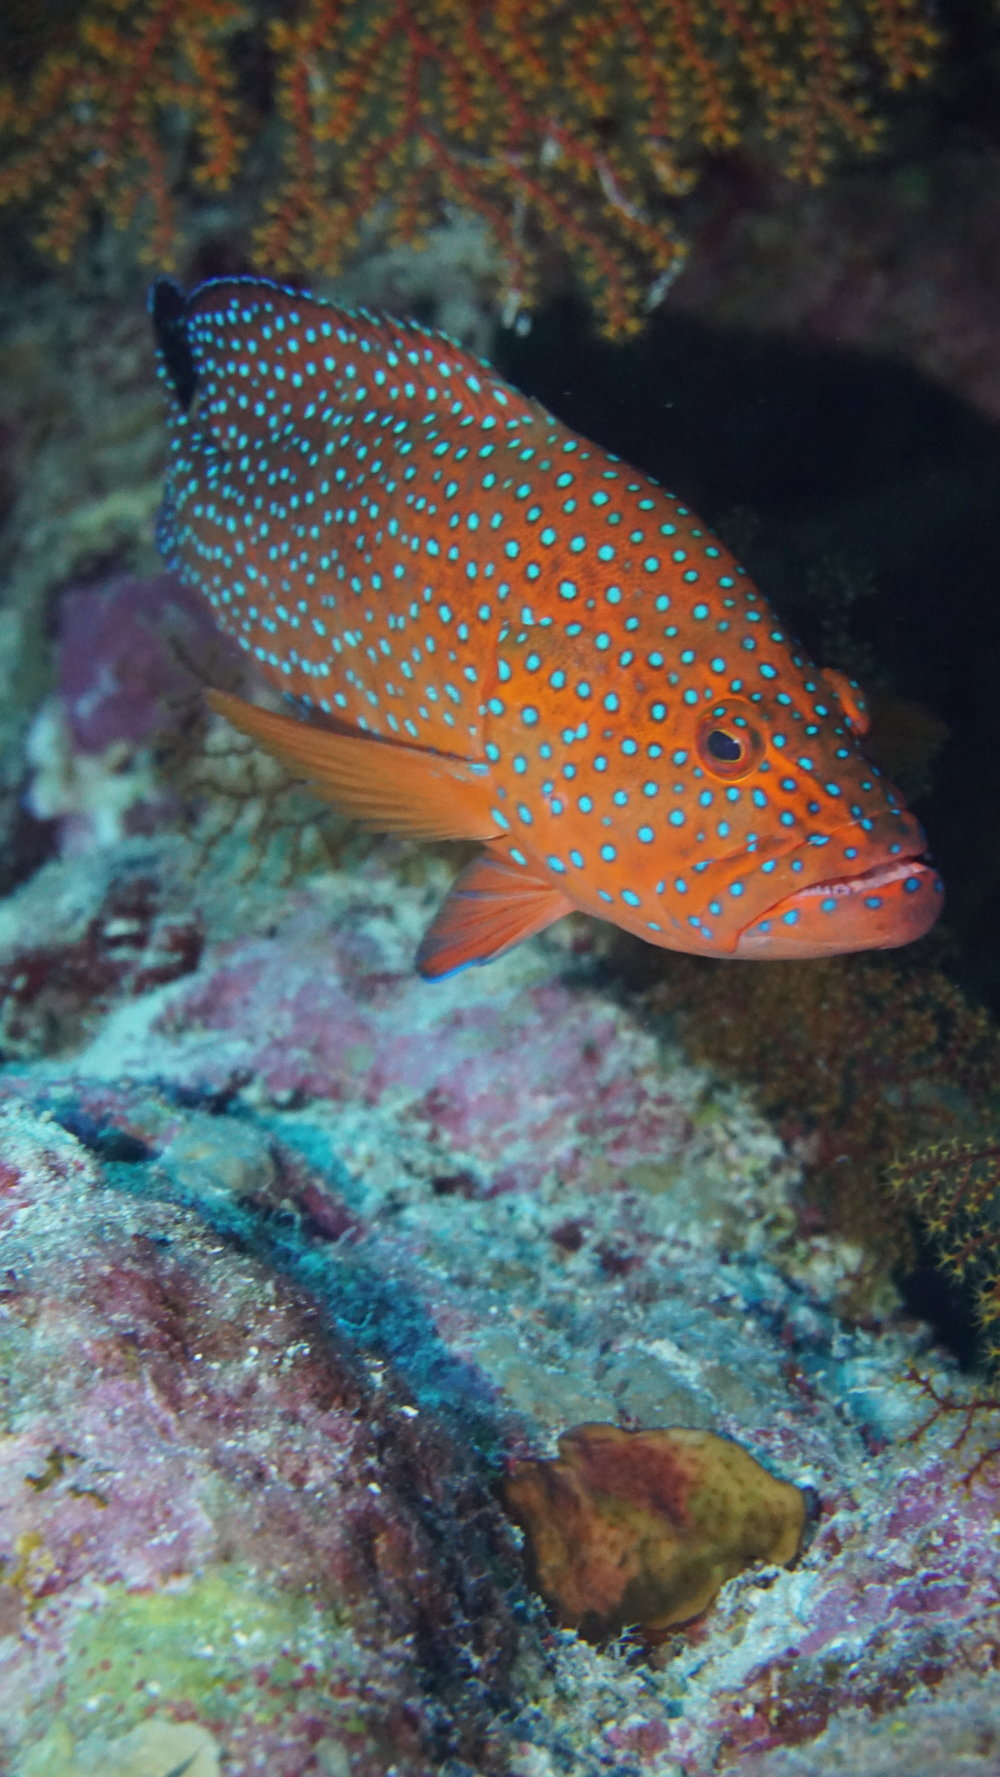 coral hind credit: Ceyhan Bekiroglu / coral reef image bank